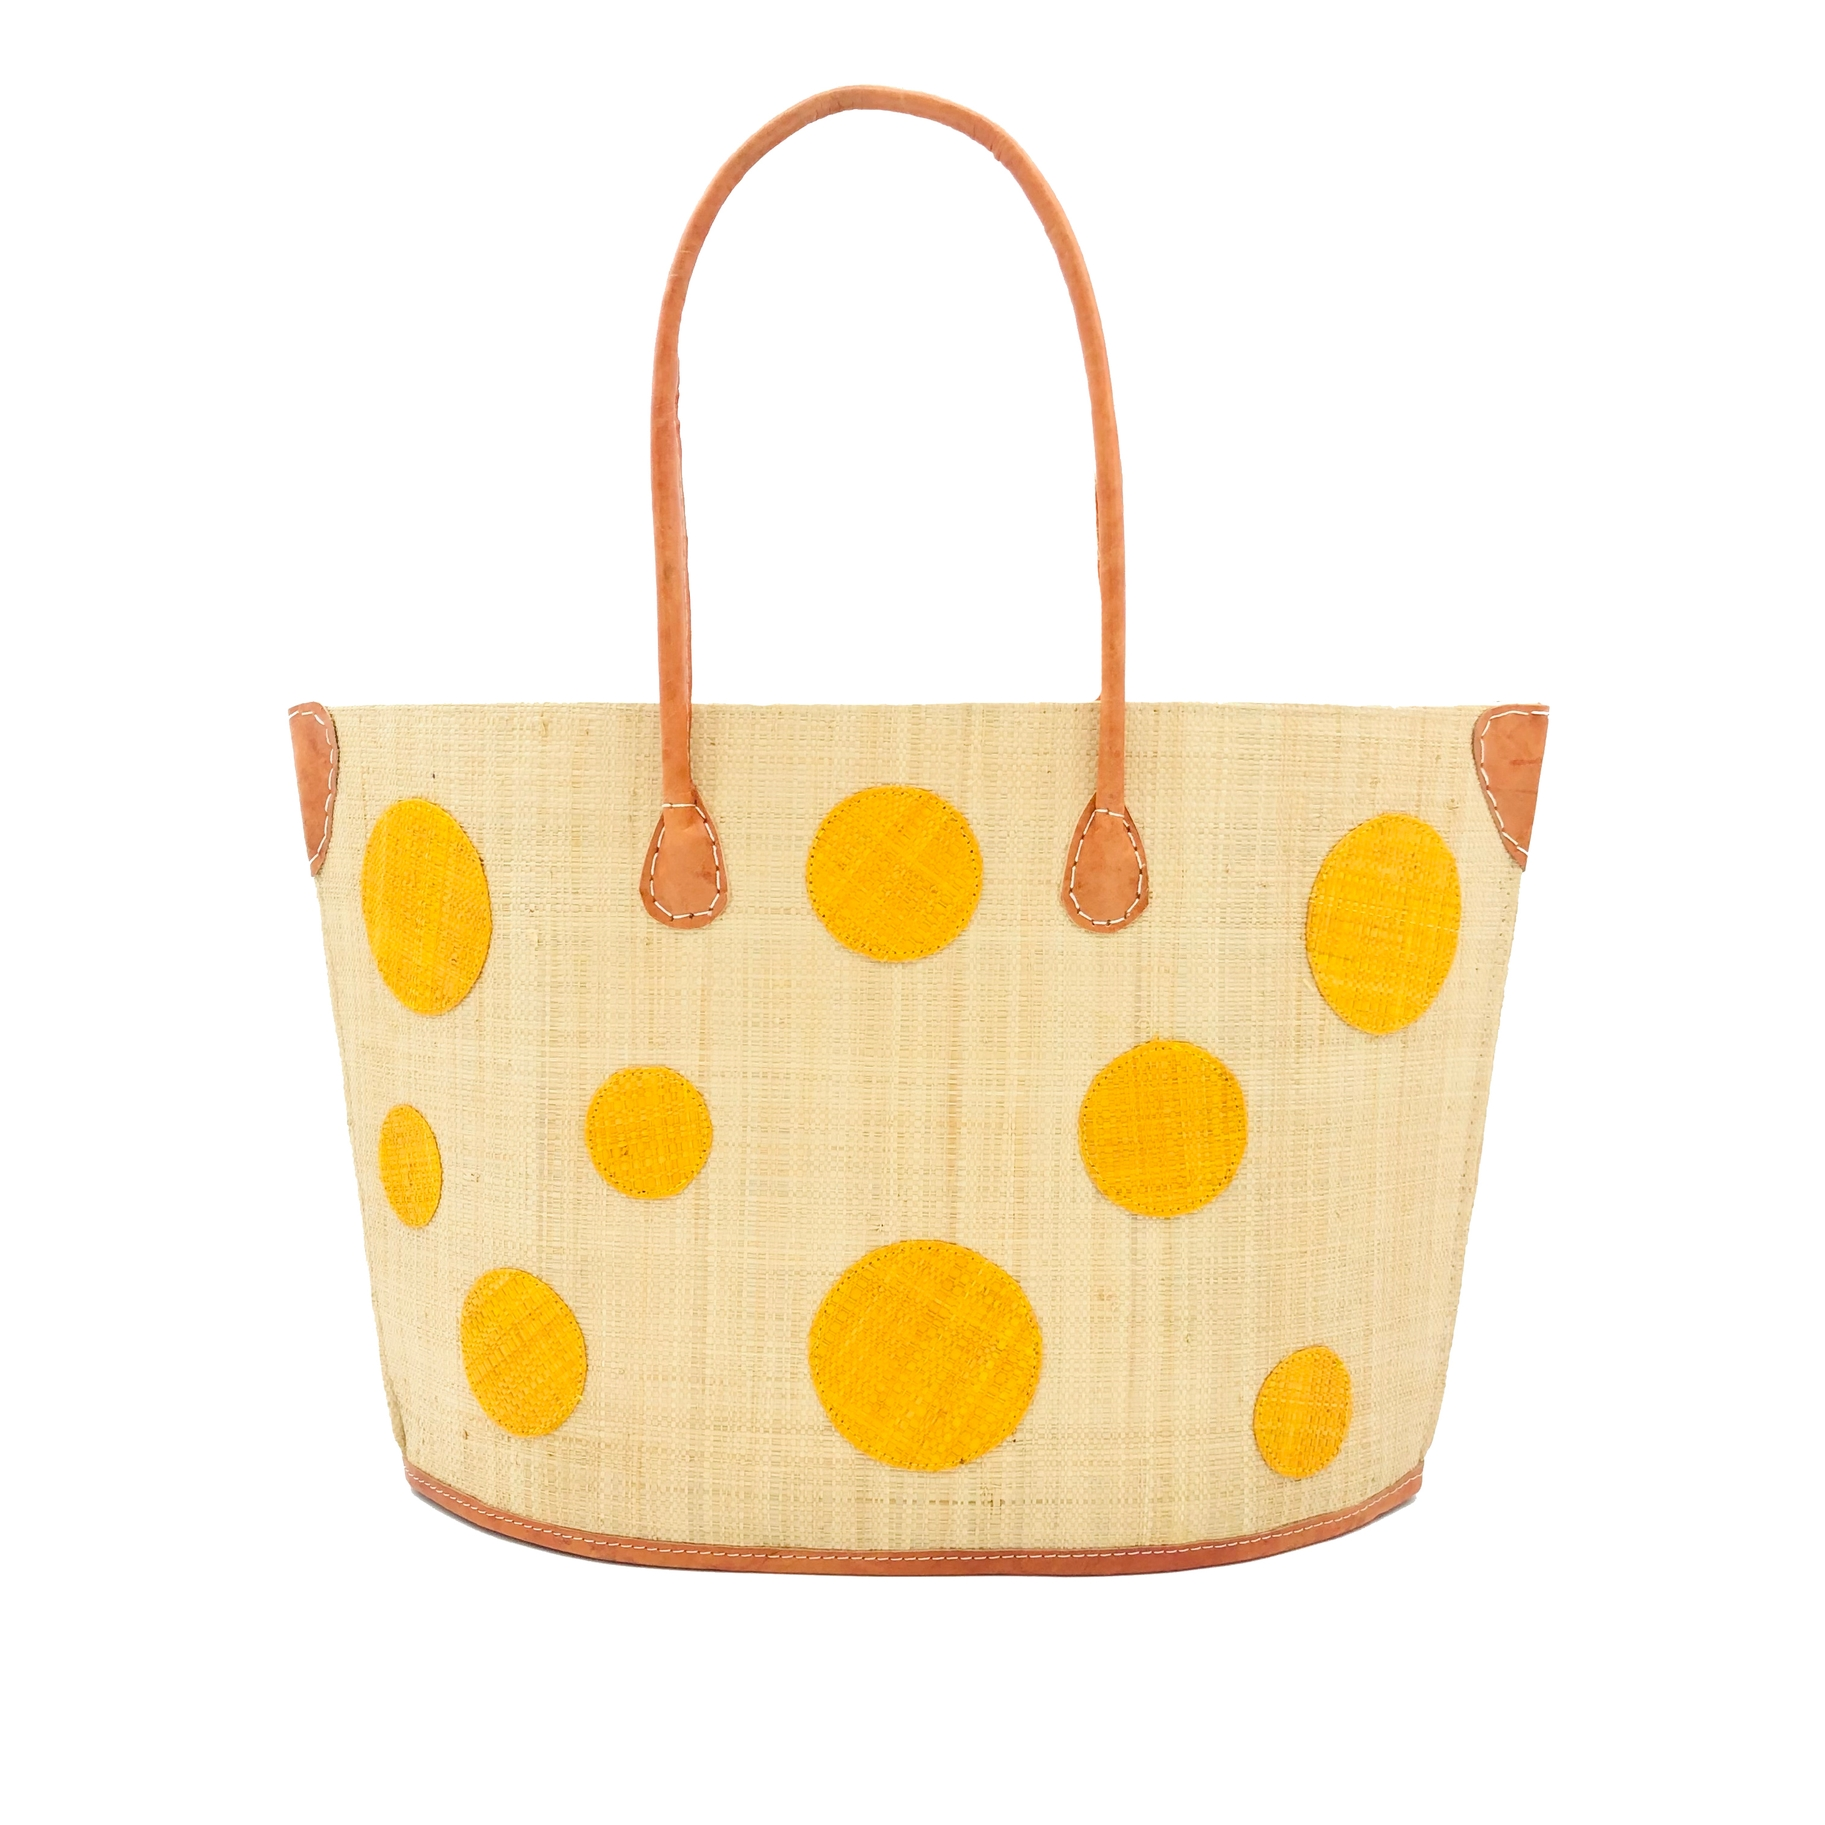 Capri Polka Dot Straw bag - Sunflower | Trada Marketplace